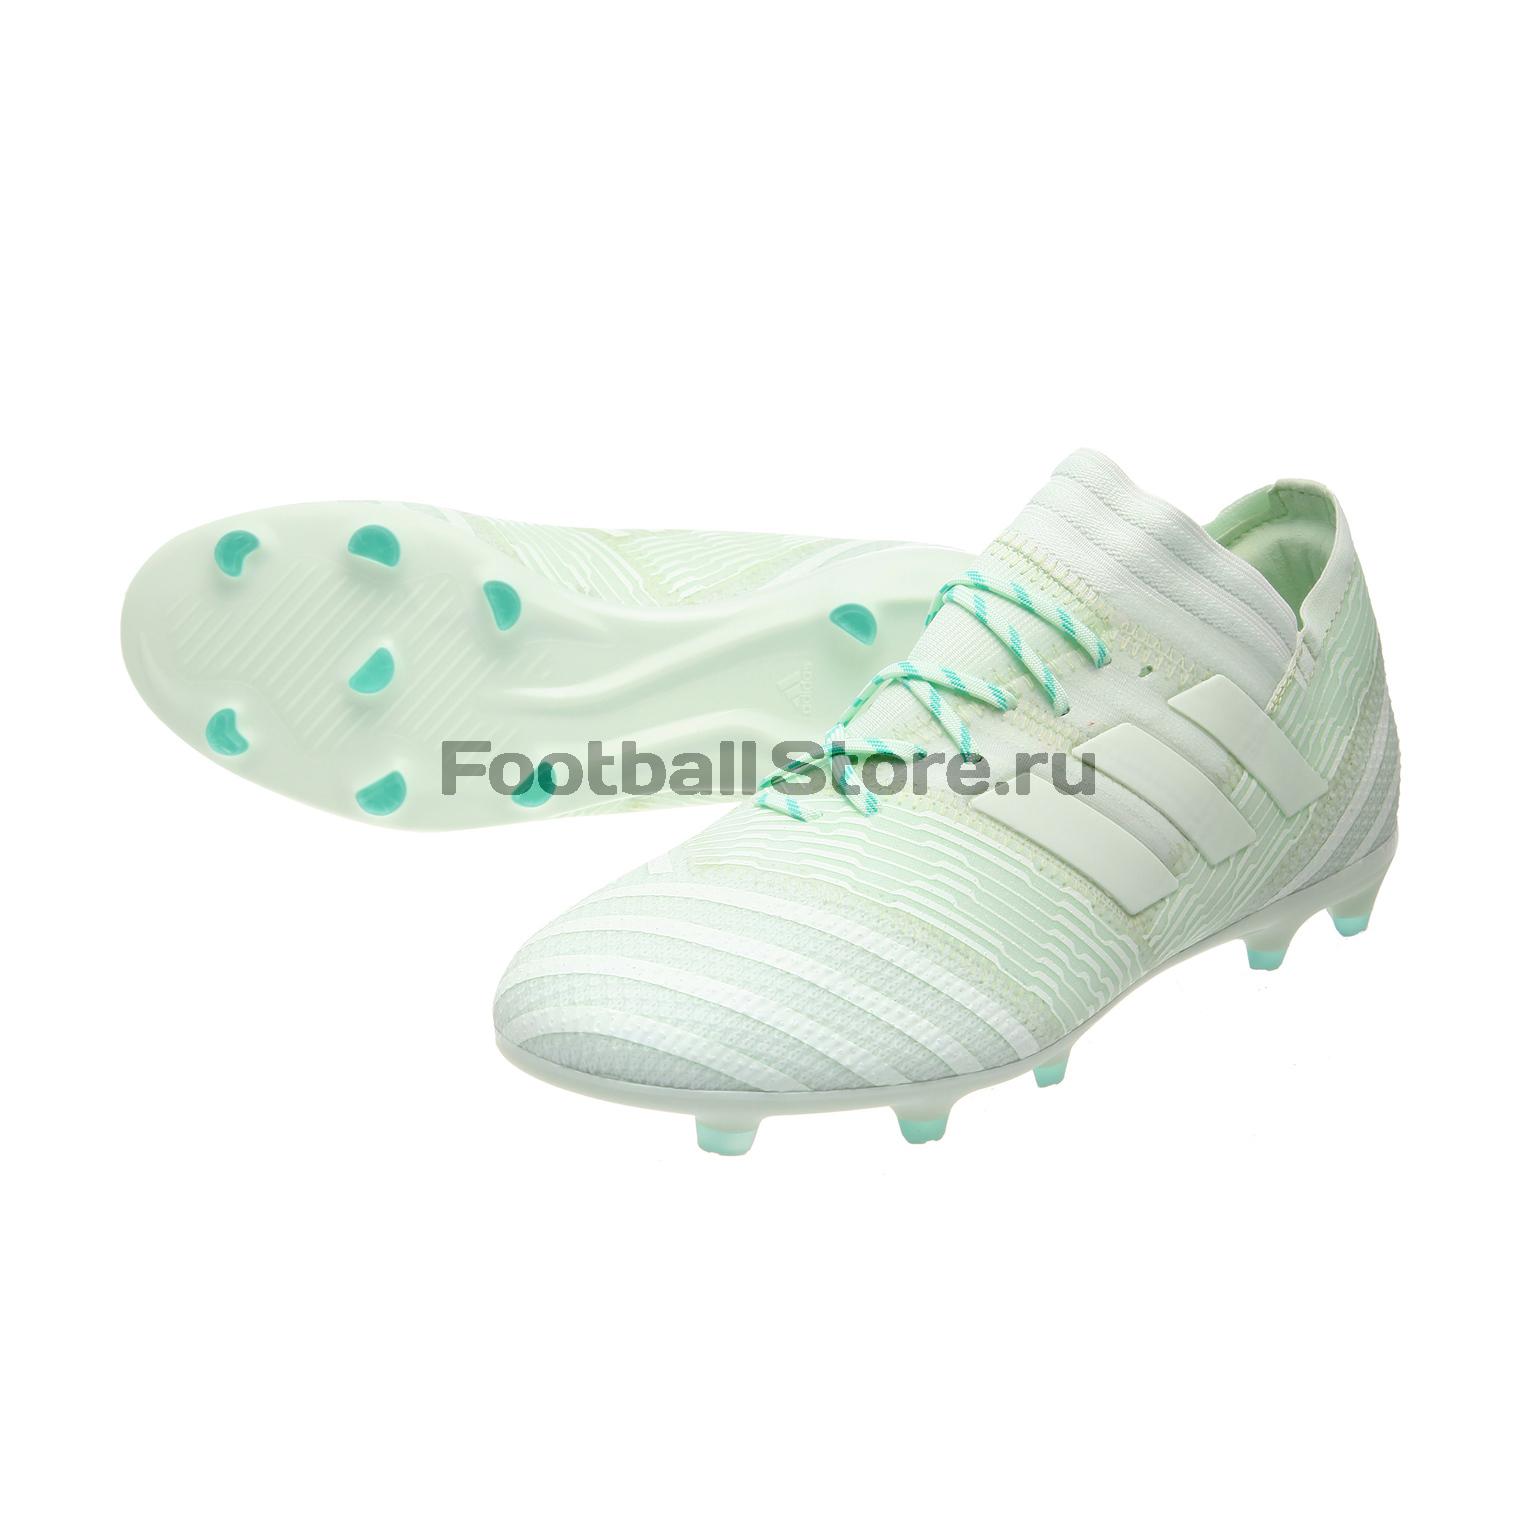 Бутсы Adidas Nemeziz Messi 17.1 FG JR CP9154 игровые бутсы adidas бутсы adidas x 16 purechaos fg bb5615